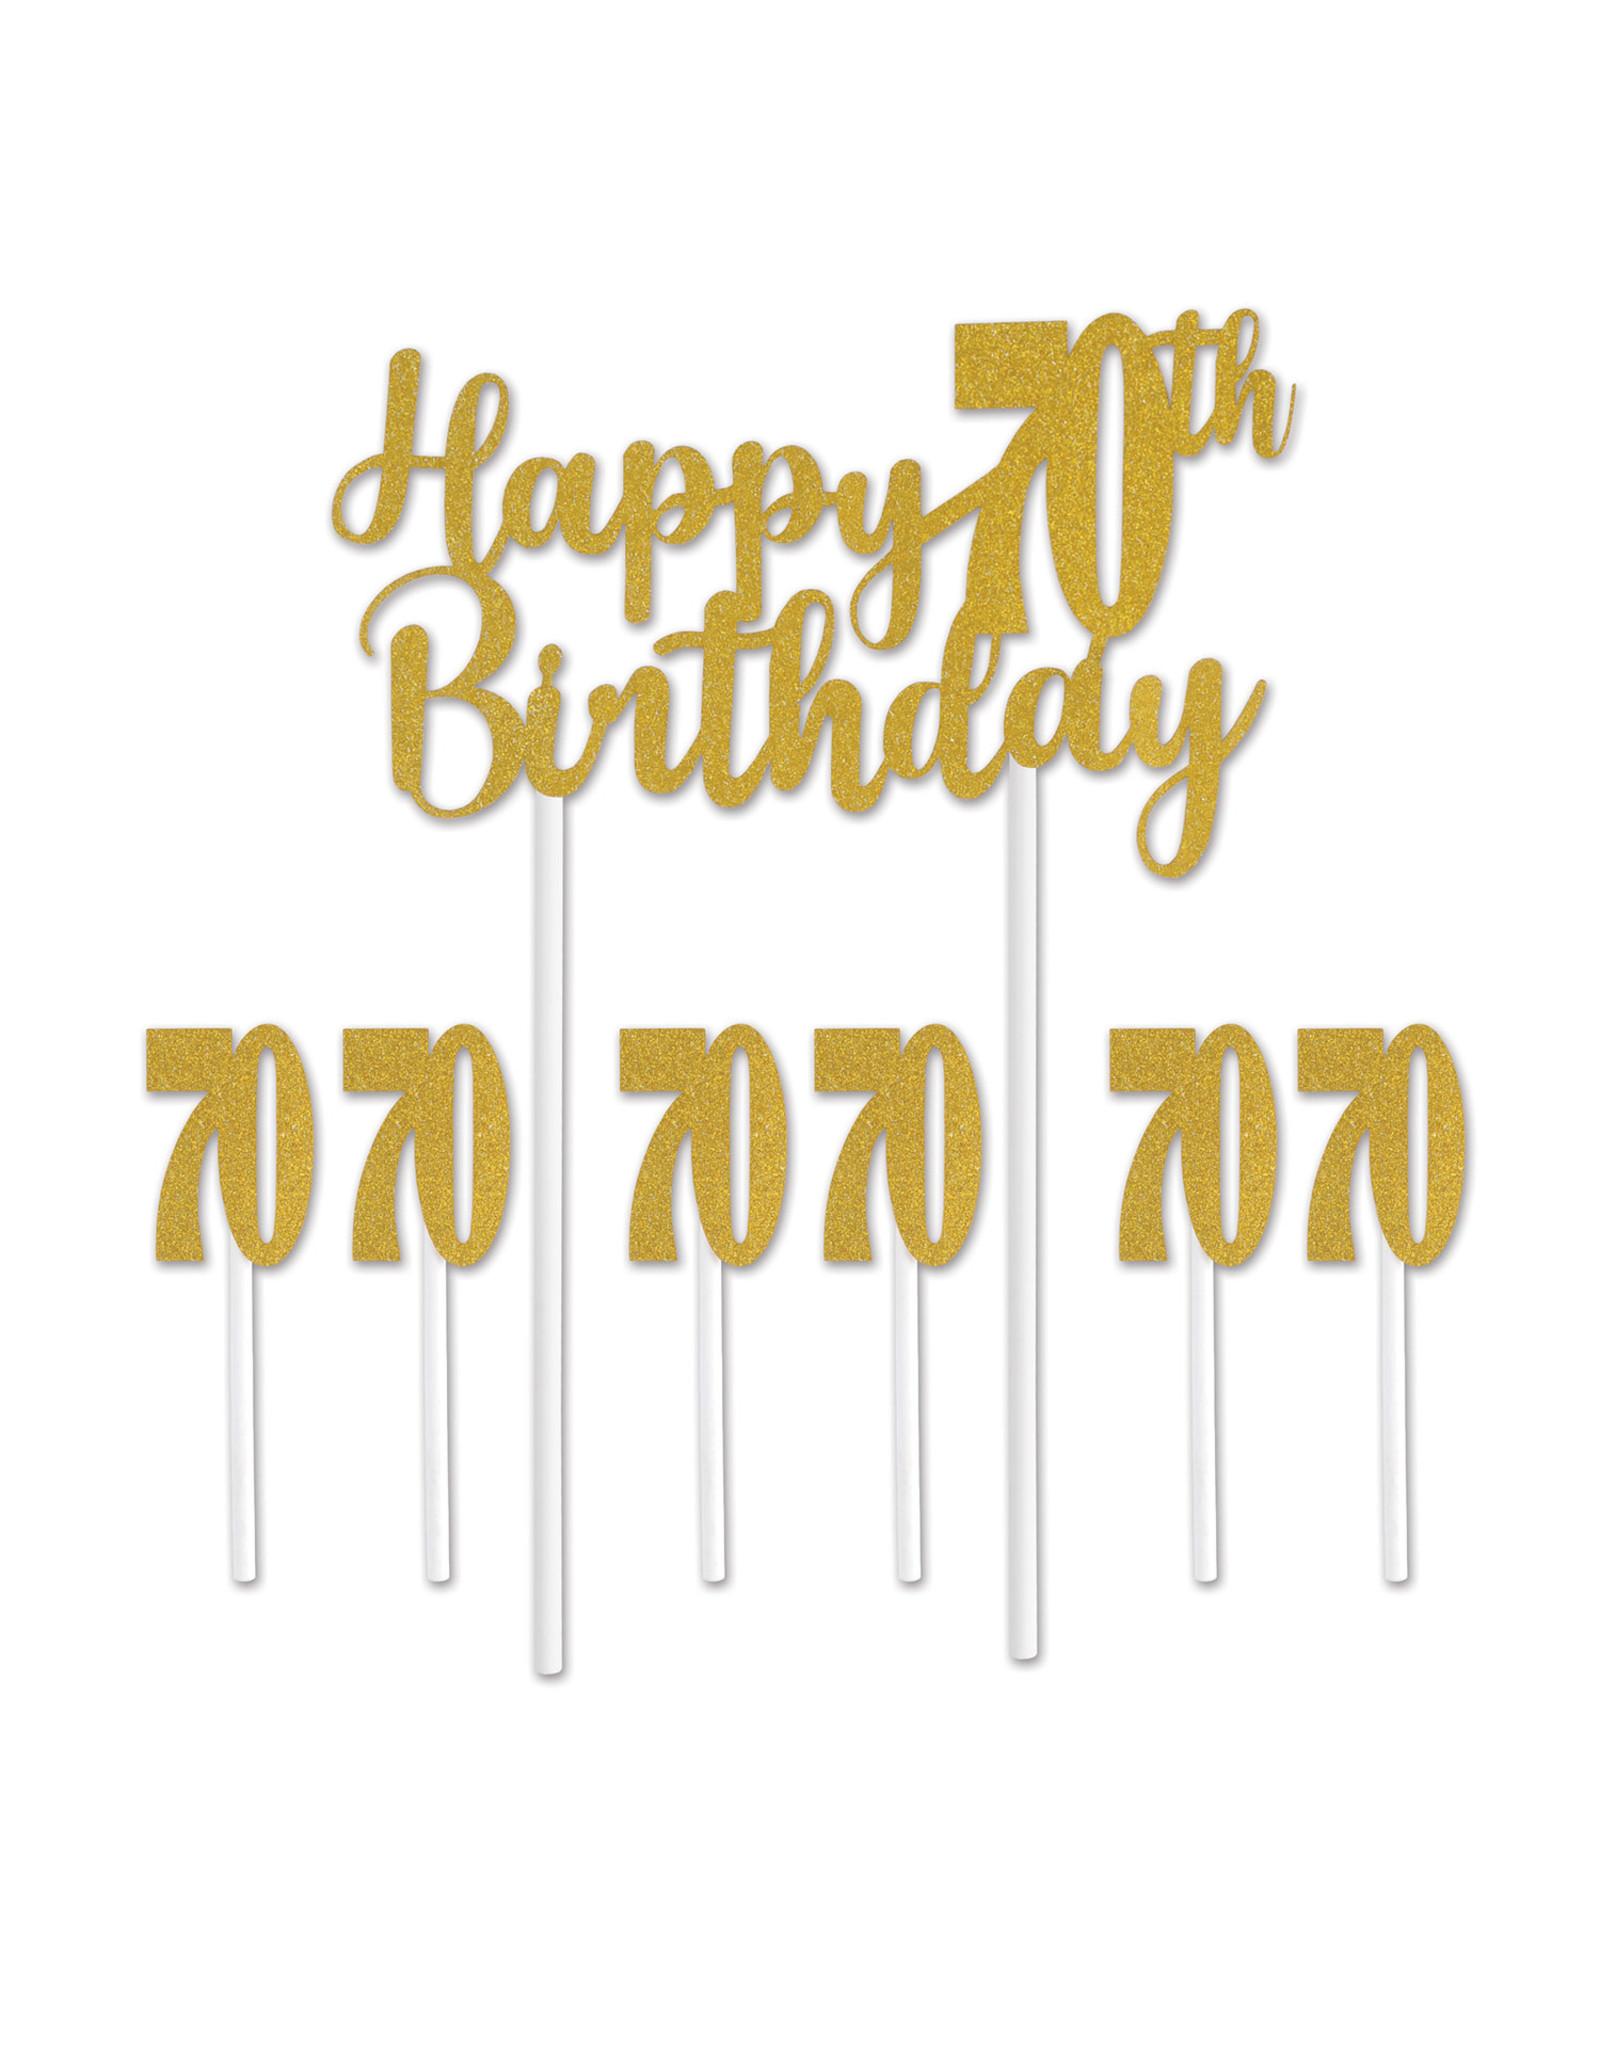 Beistle 70th Birthday Cake topper